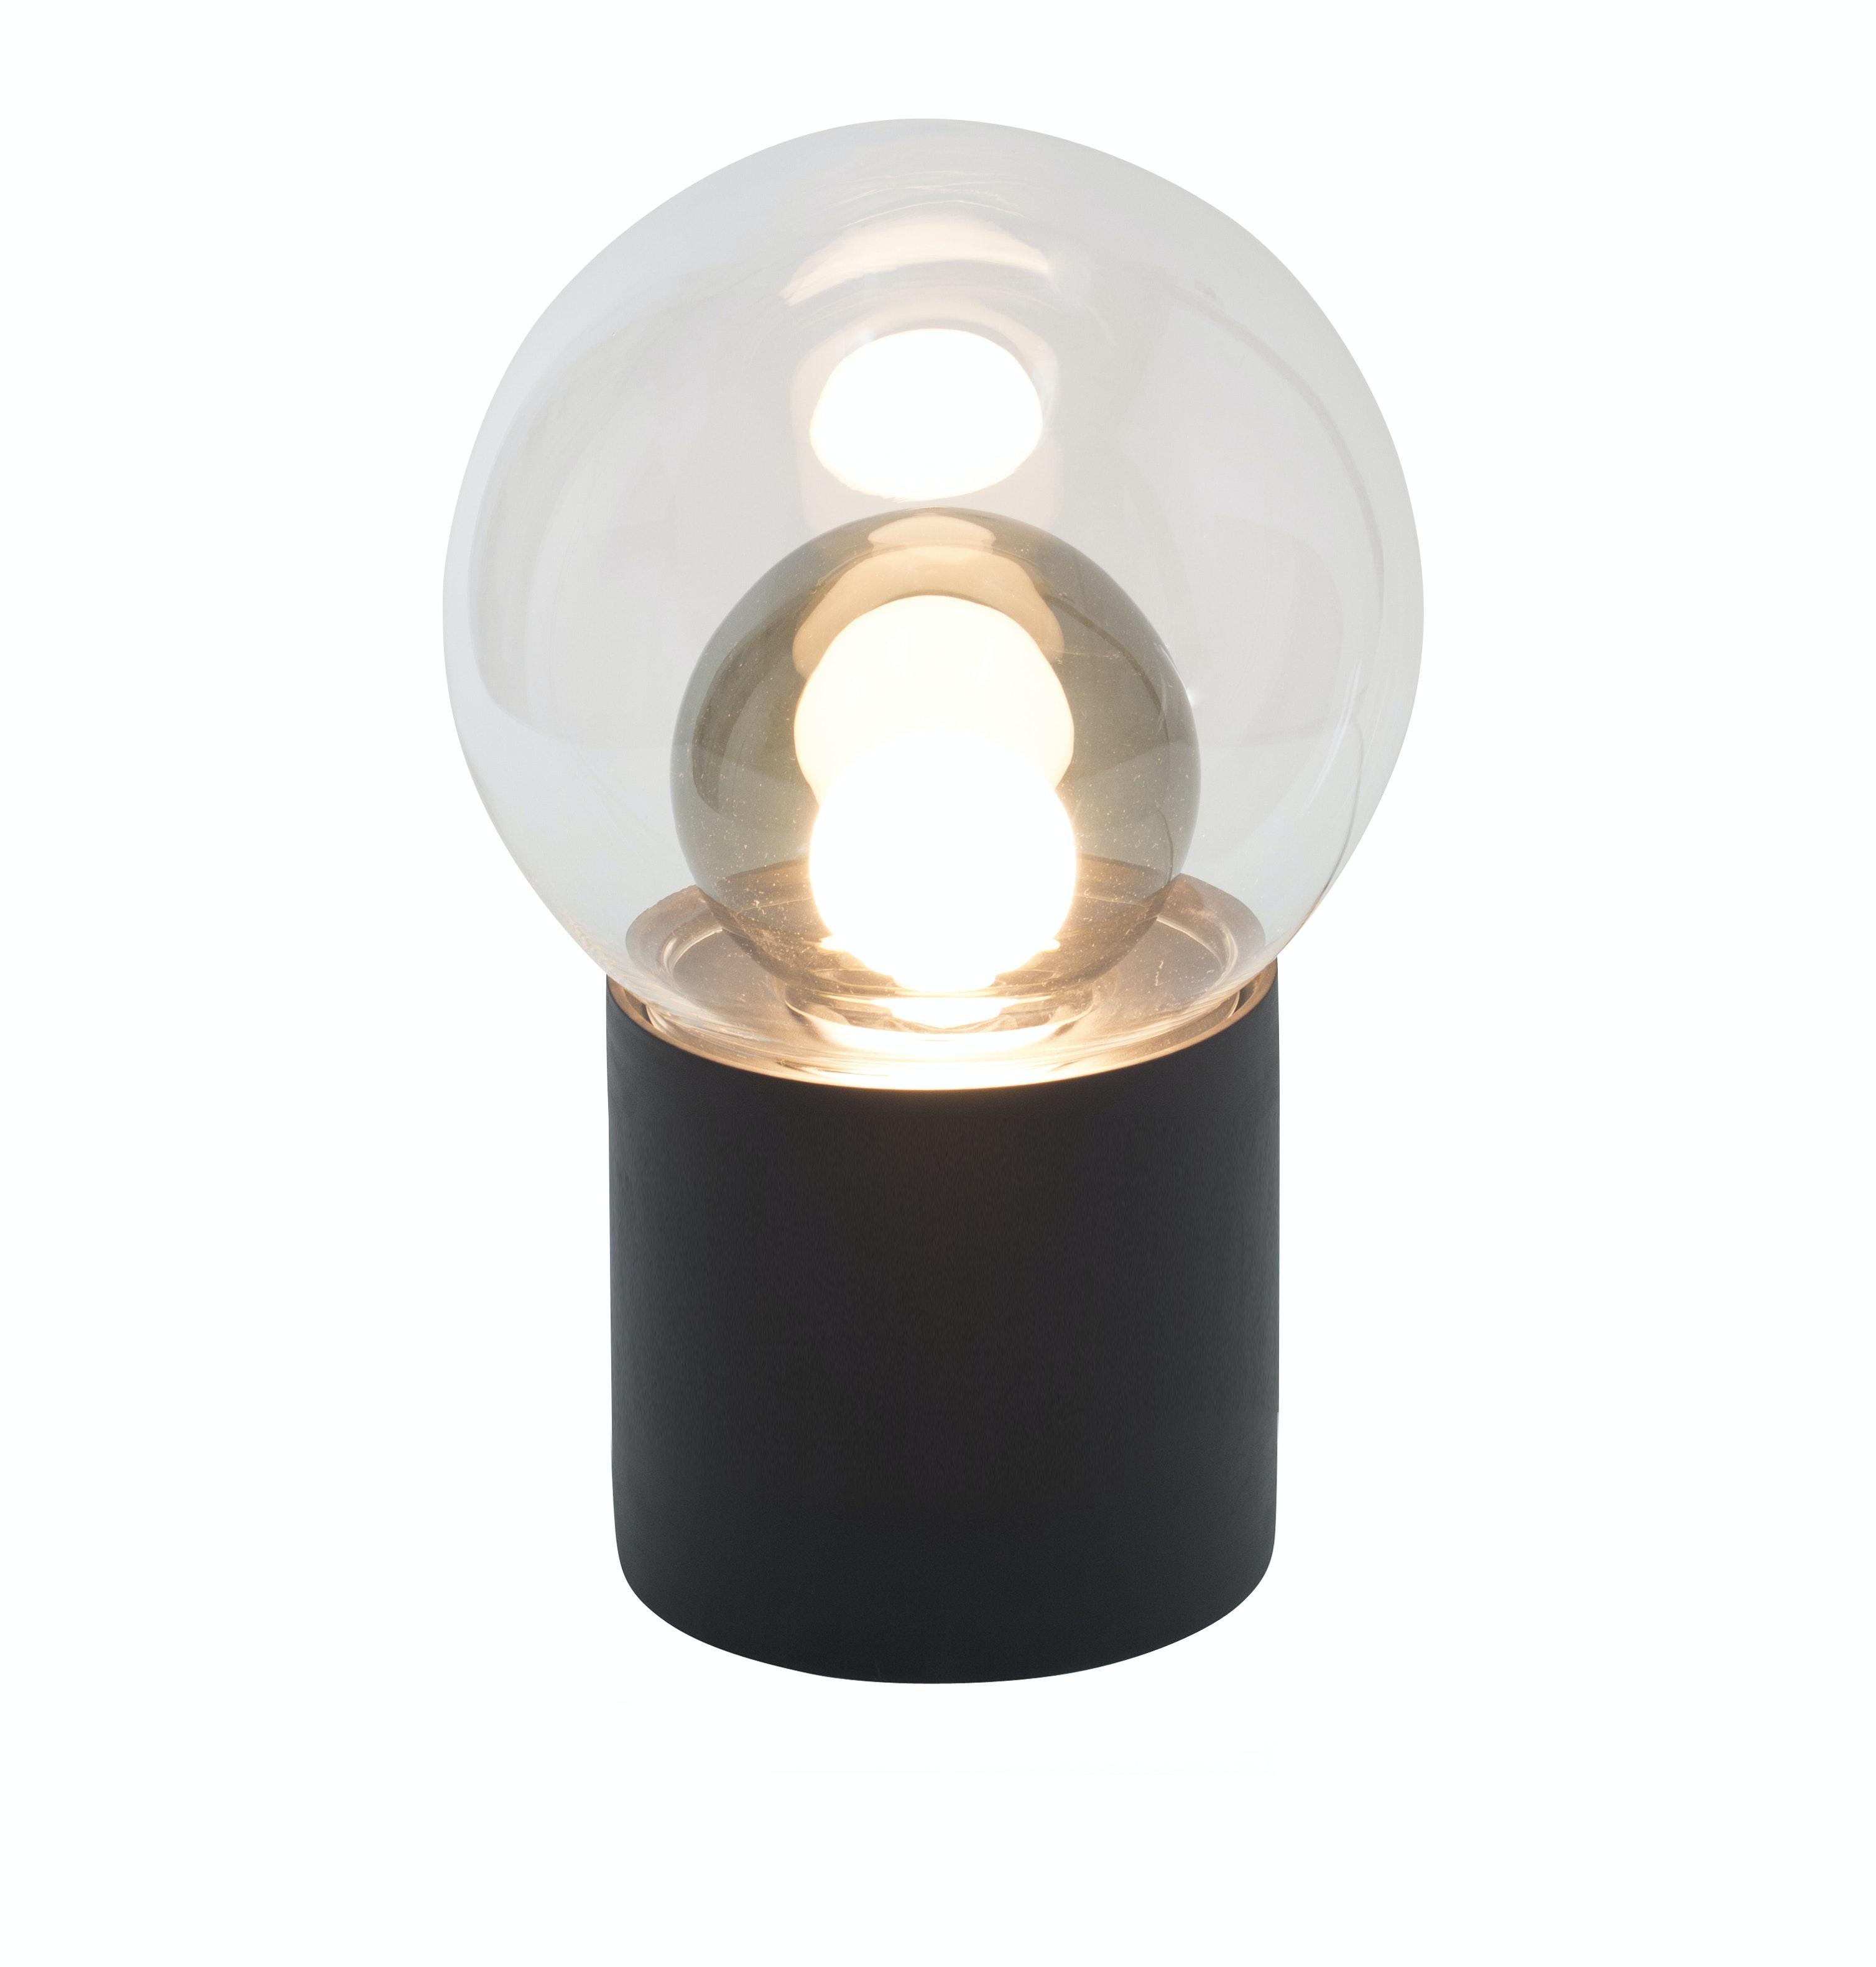 Boule High Transparentsmoky Greyblack 5000 Tgs